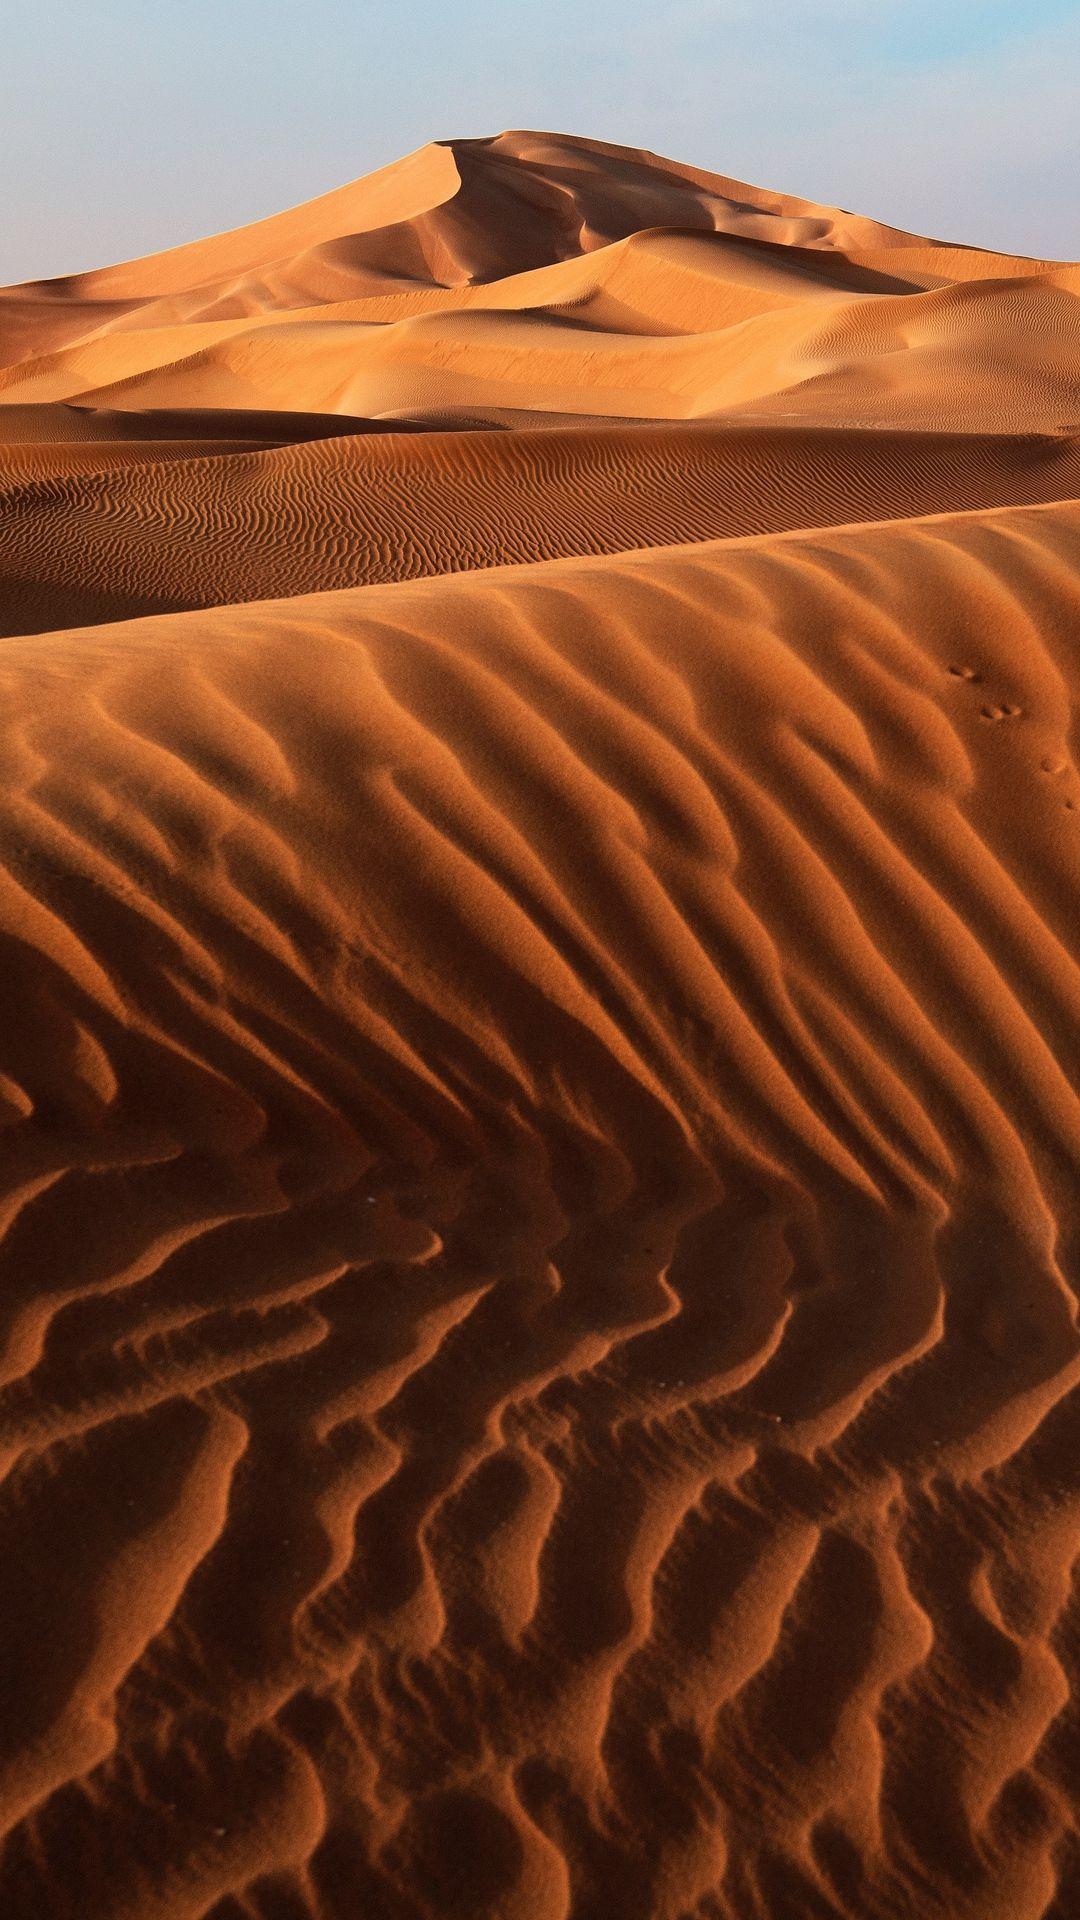 The Dunes In The Desert Photo